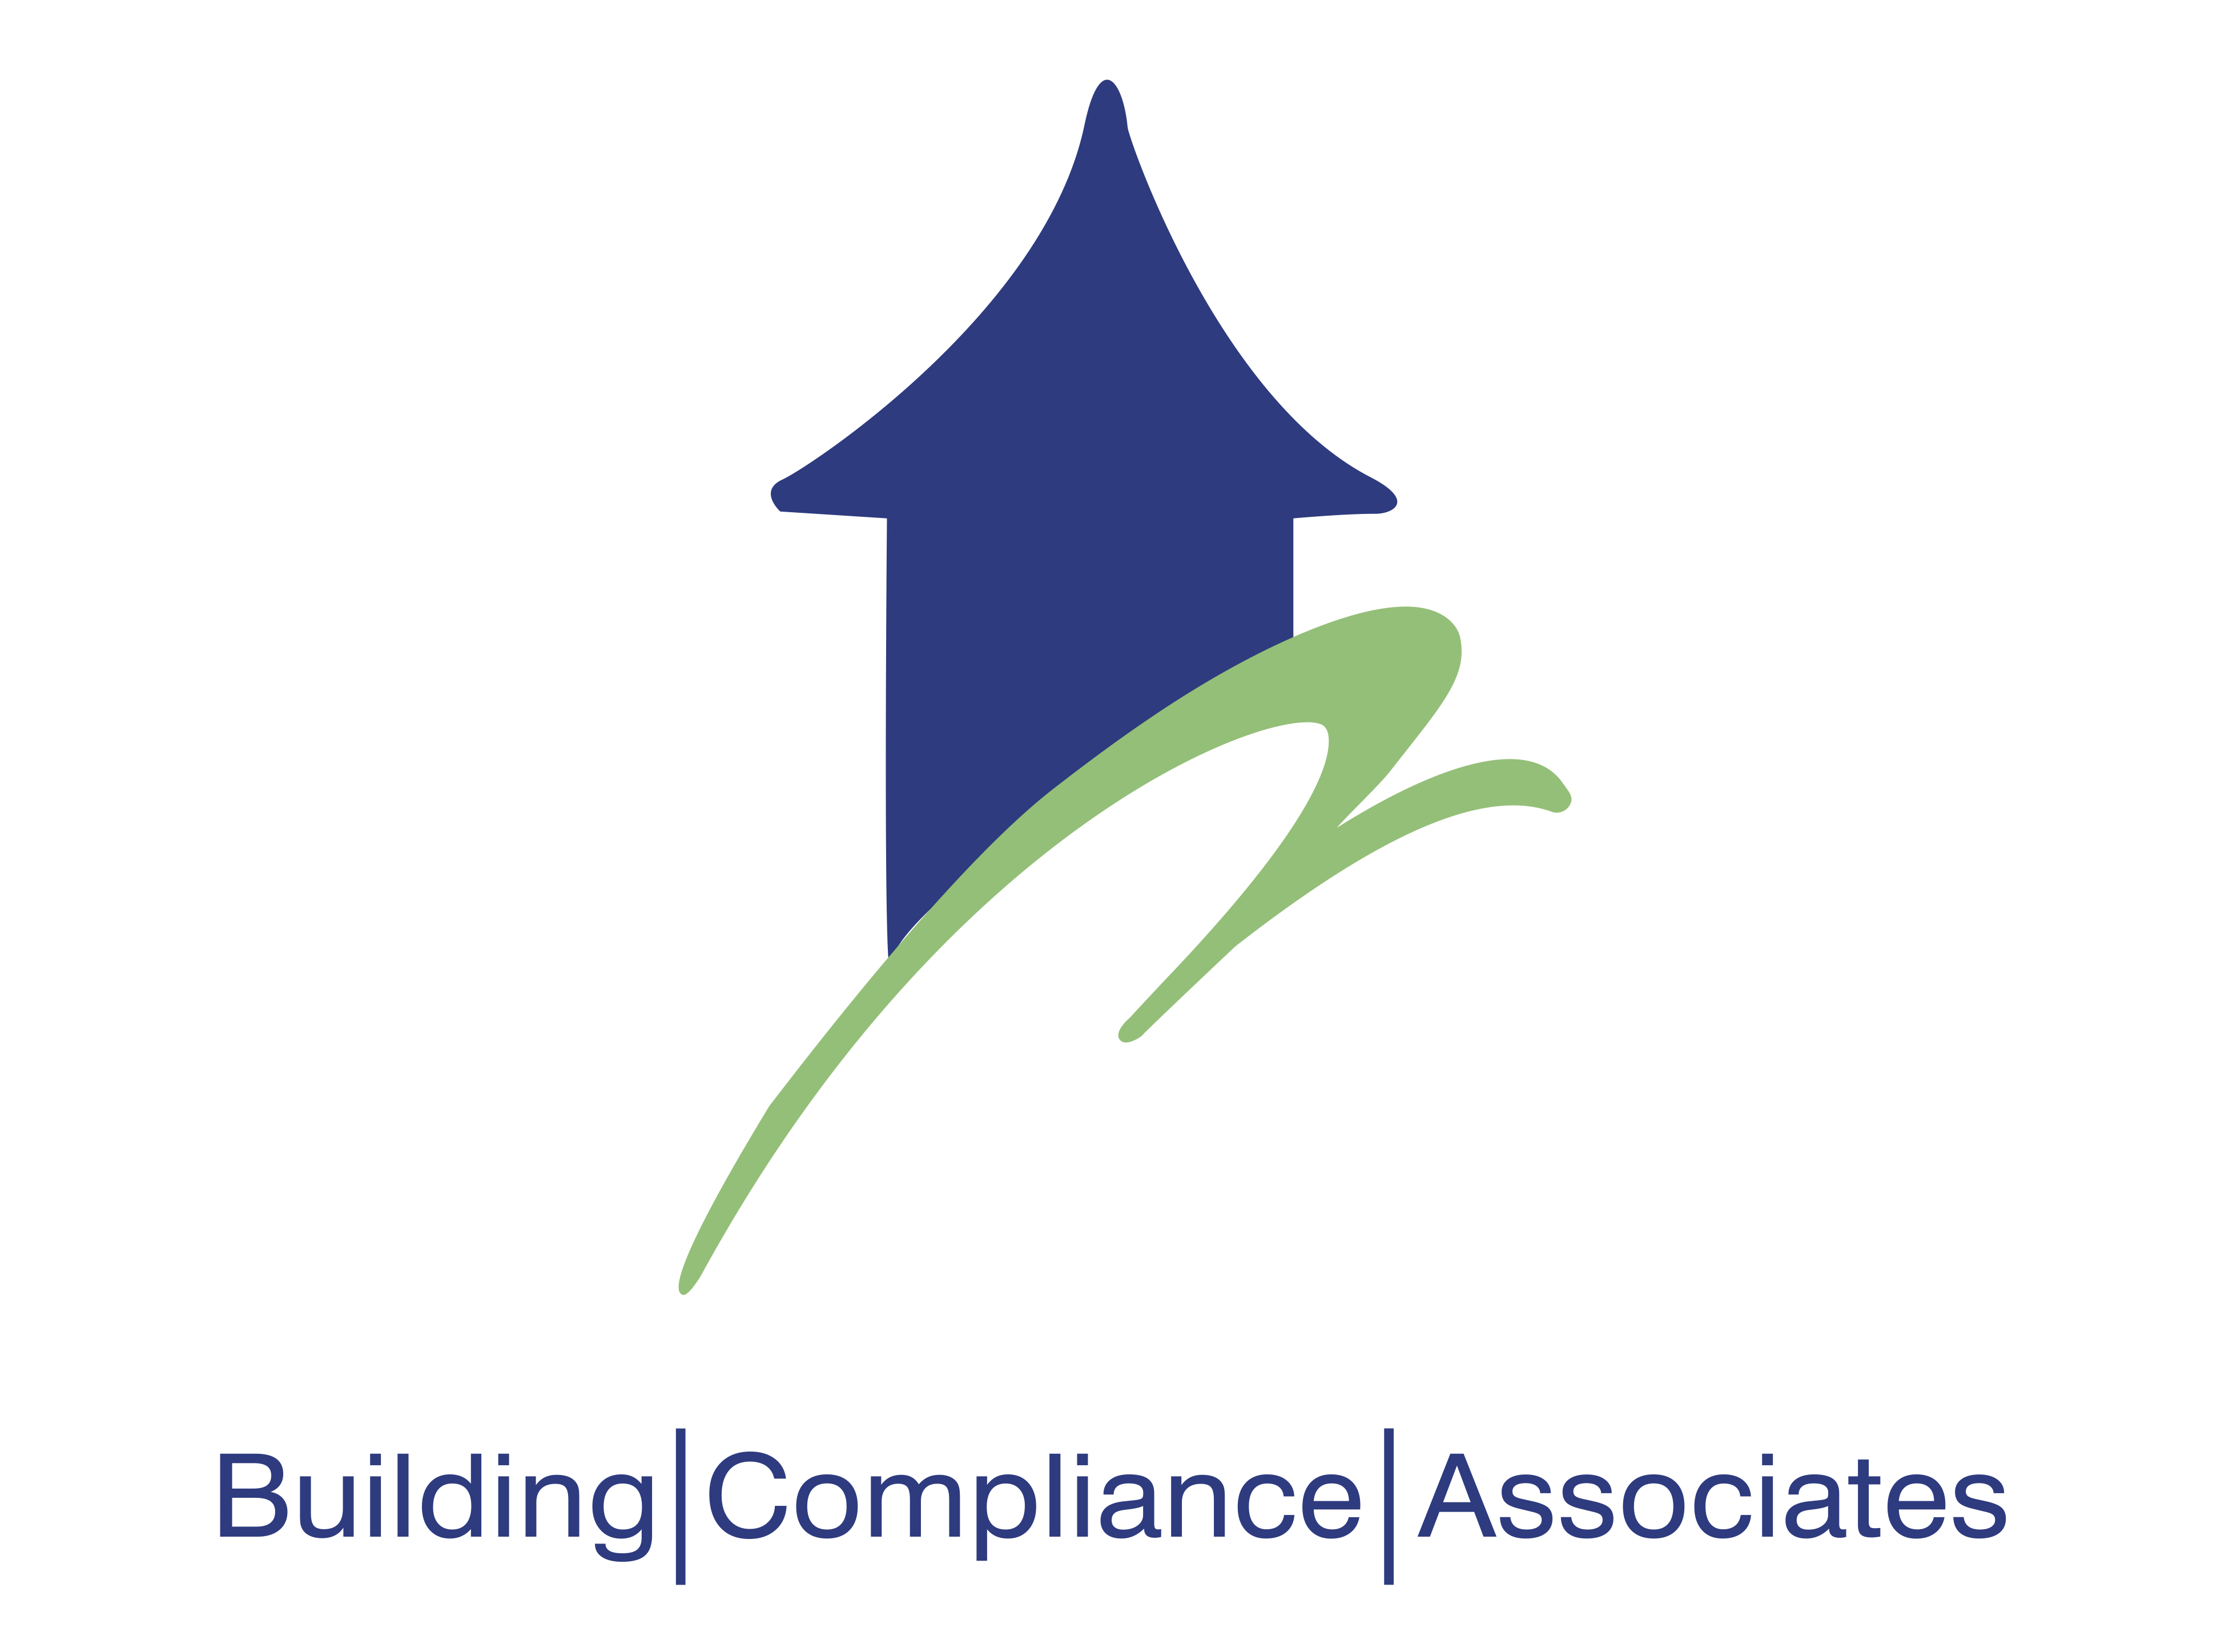 Building|Compliance|Associates